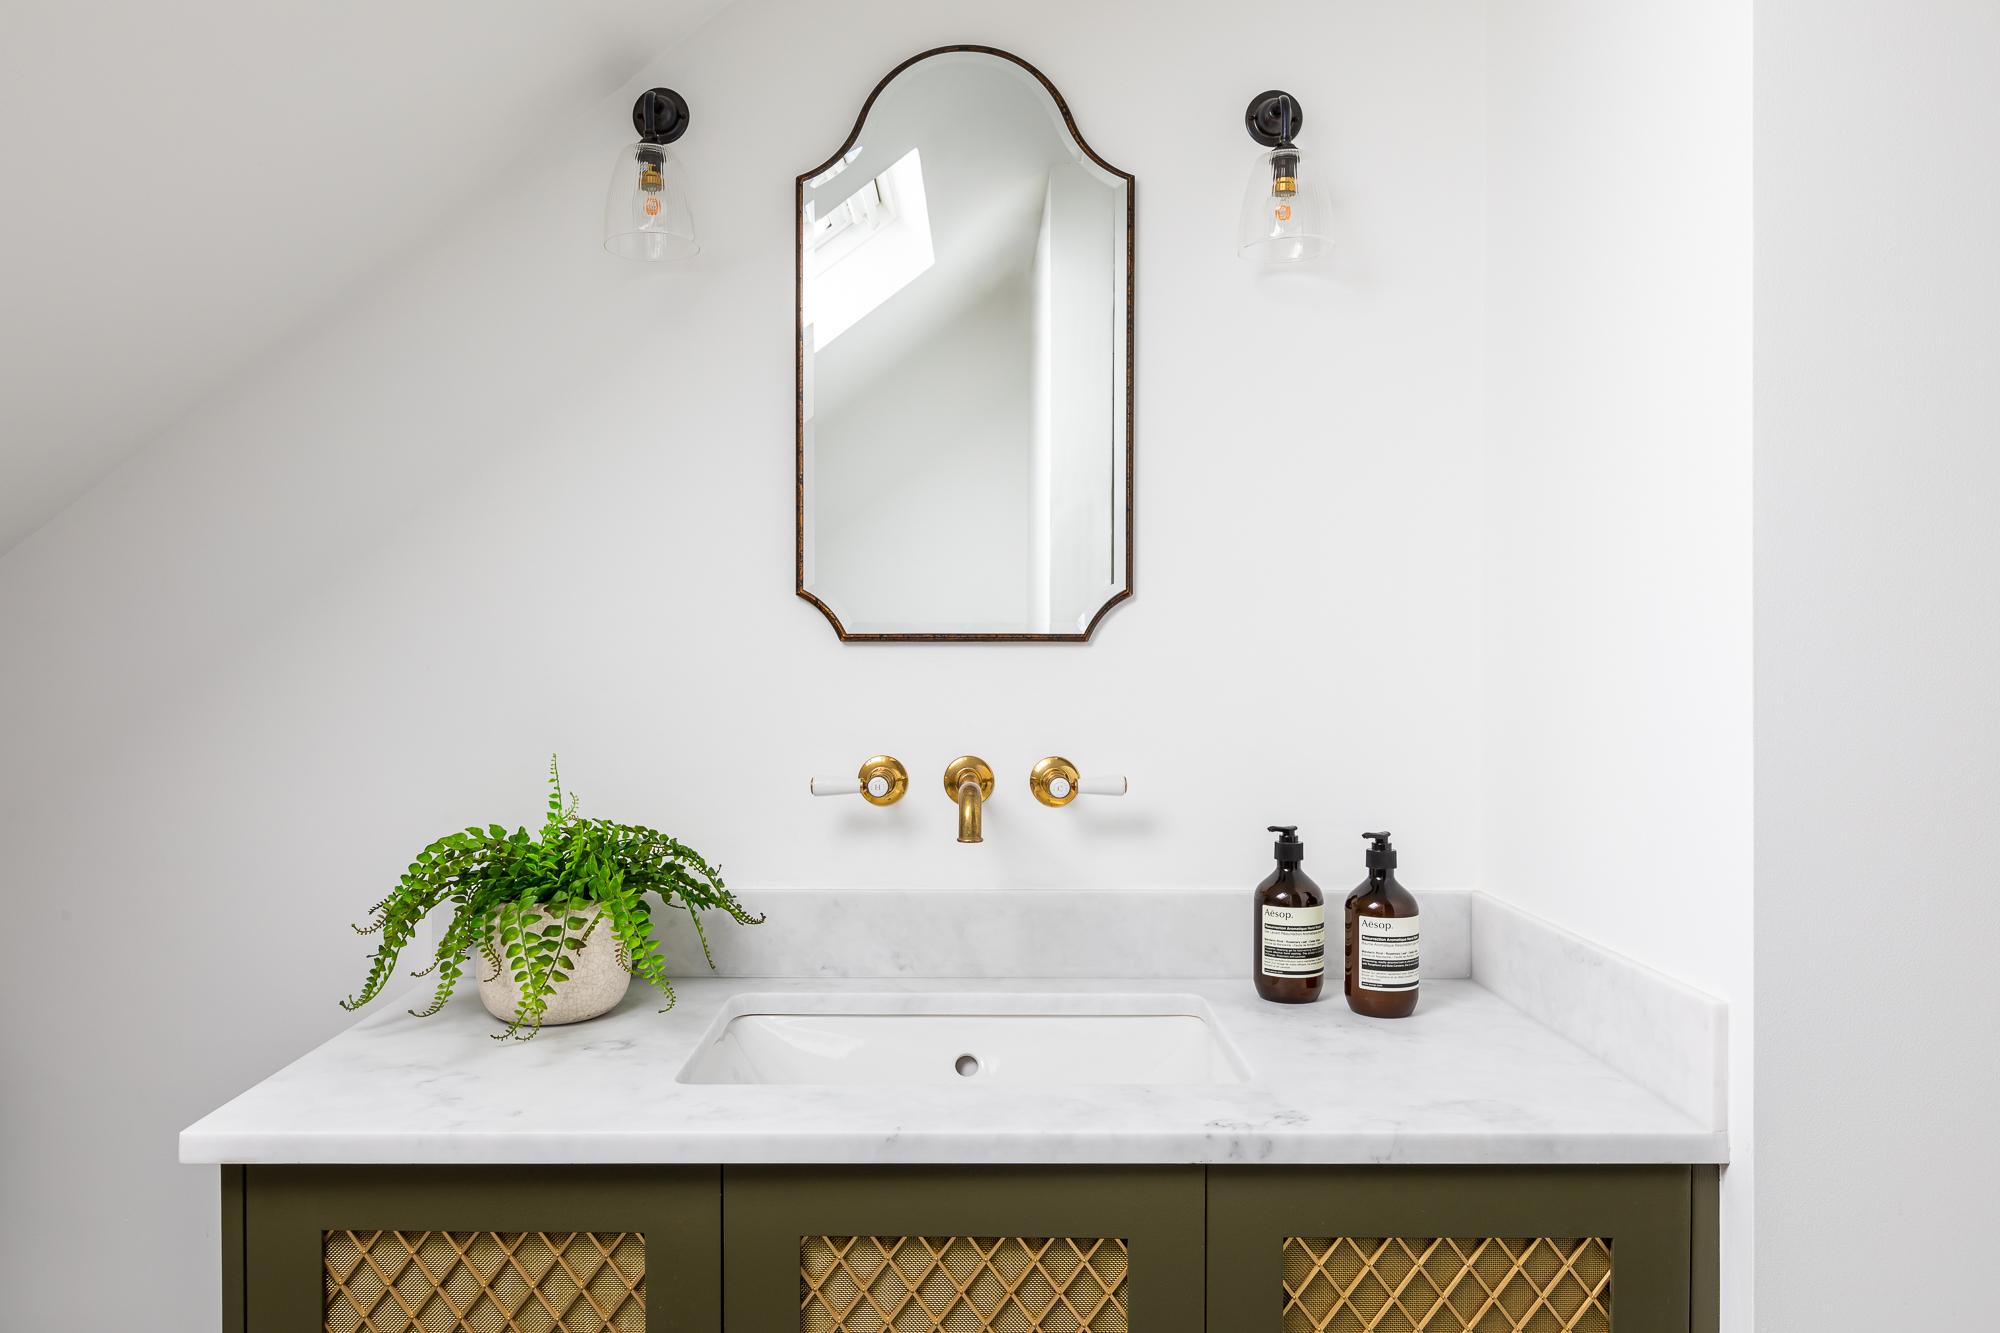 jonathan bond,  bathroom vanity cabinet & wall mirror, clapham, london